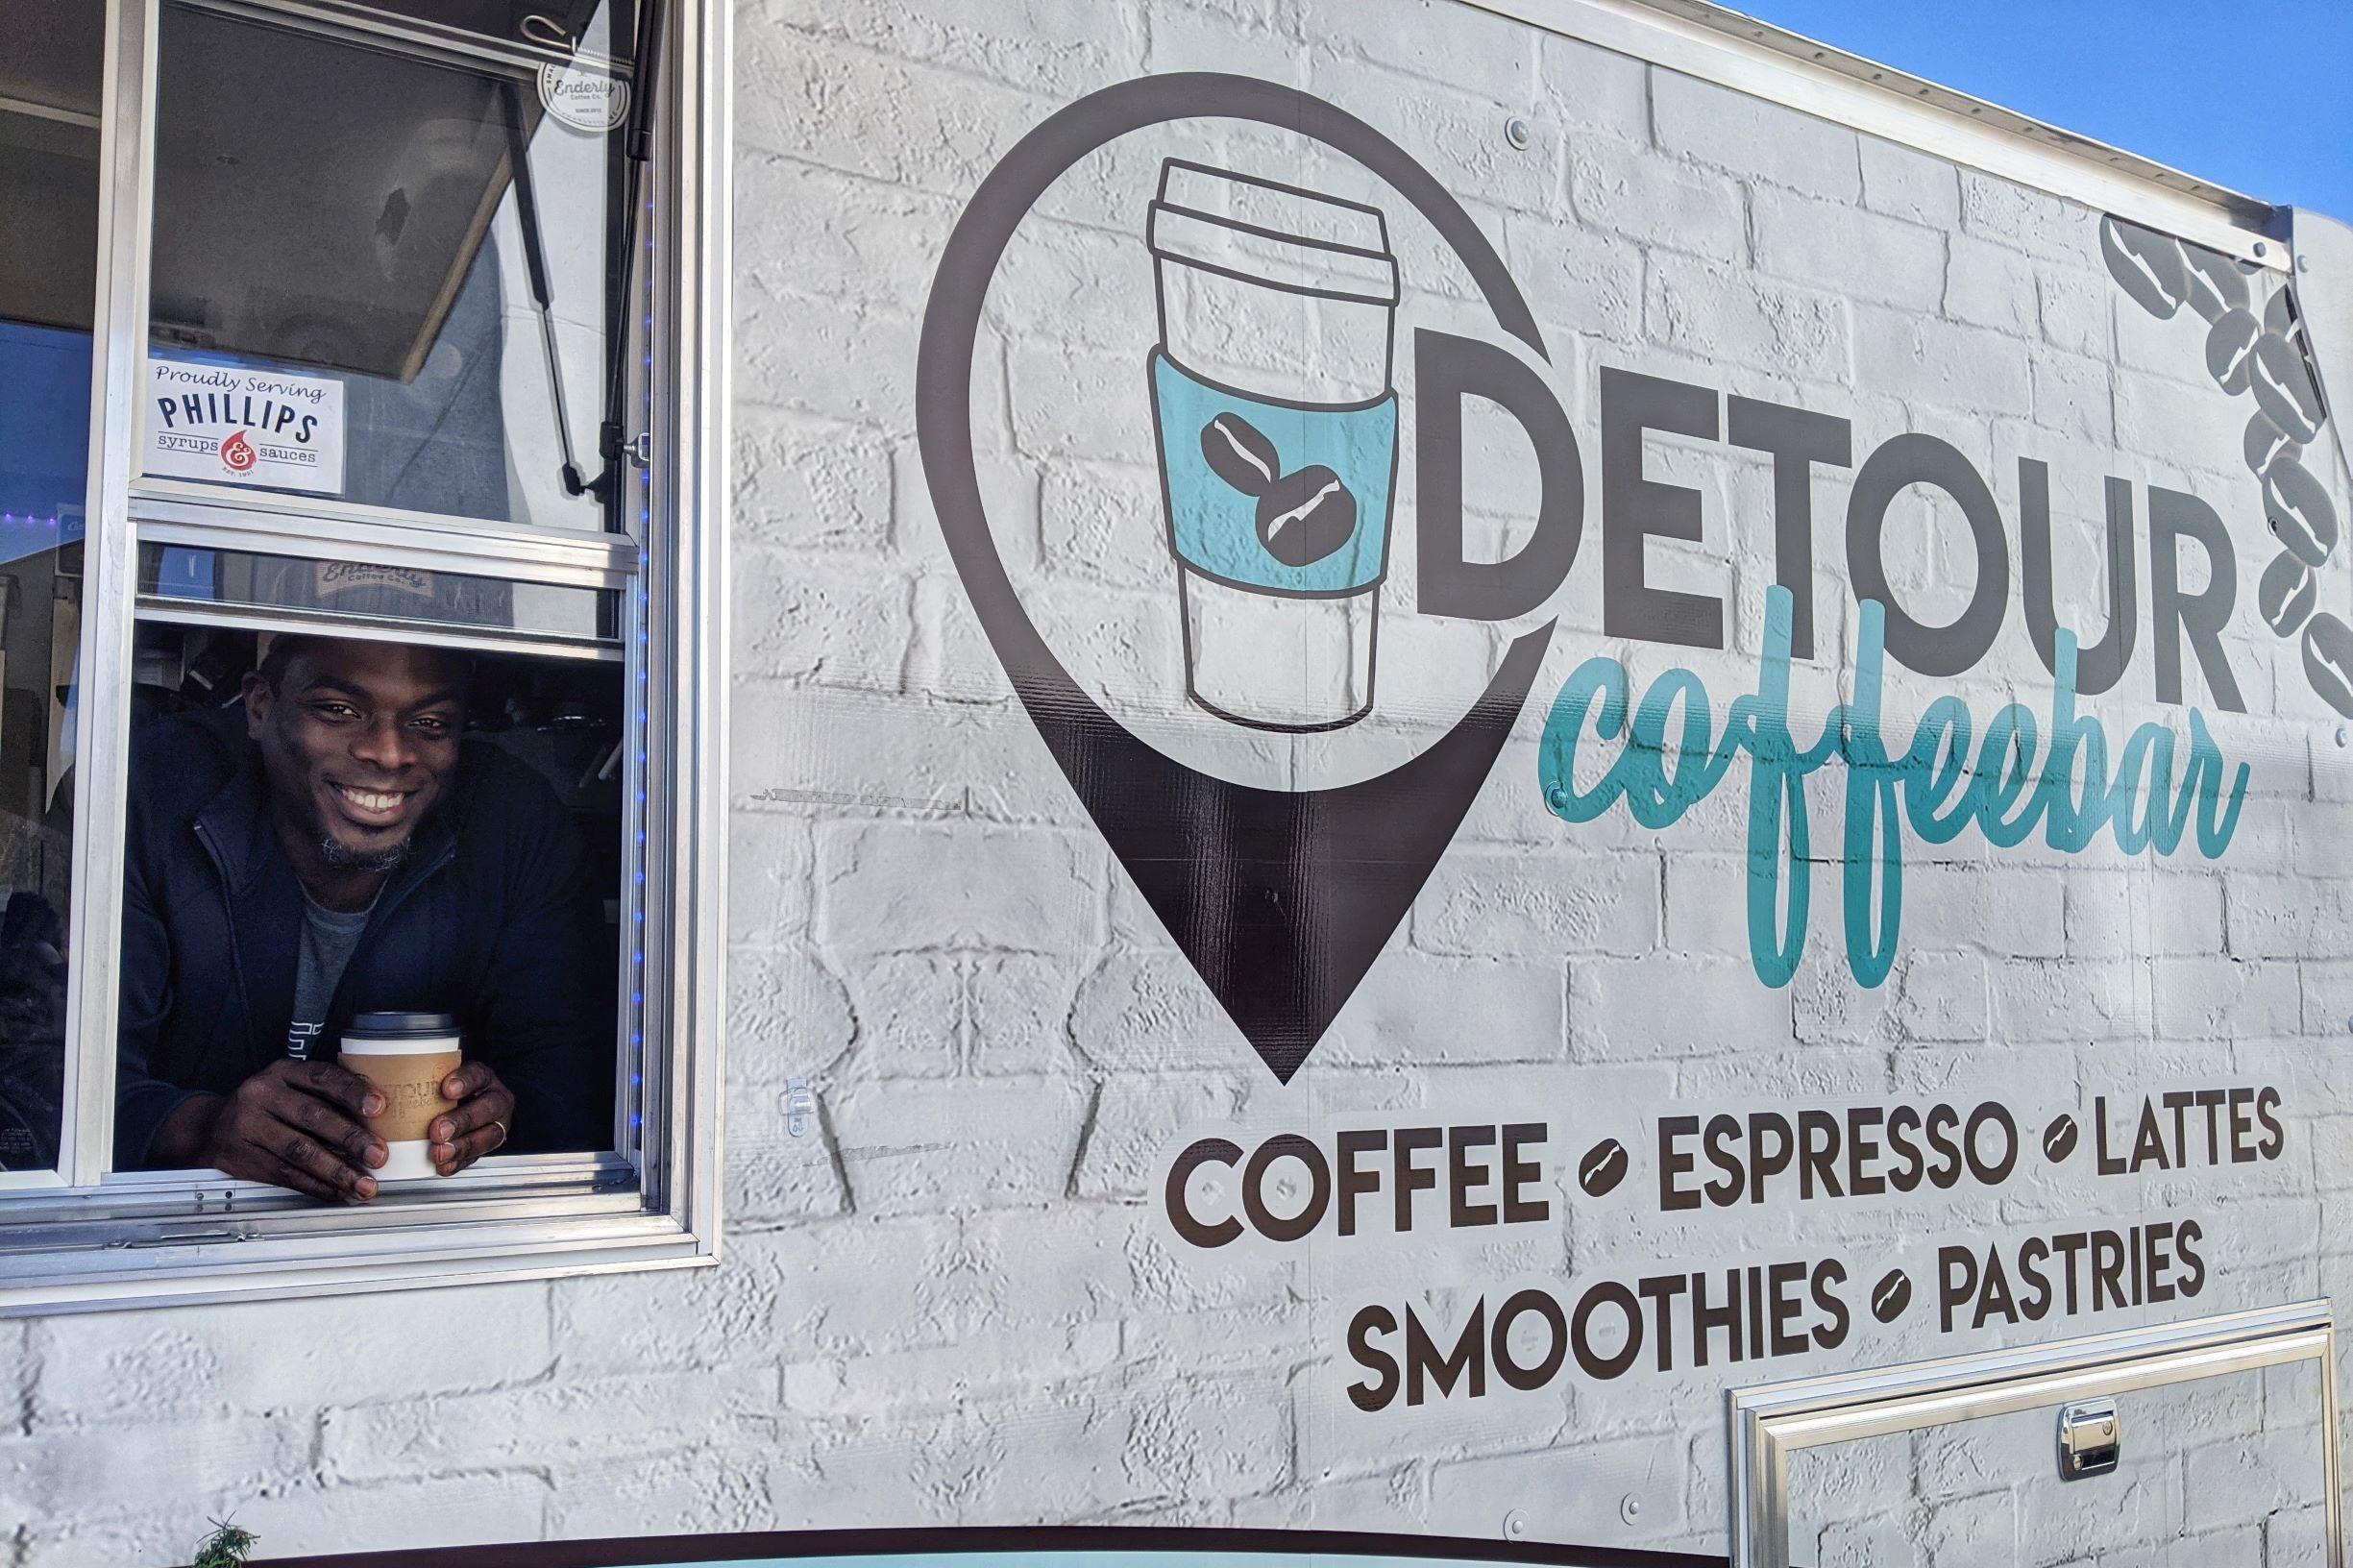 Mike-Hargett-Detour-Coffee-Bar-1